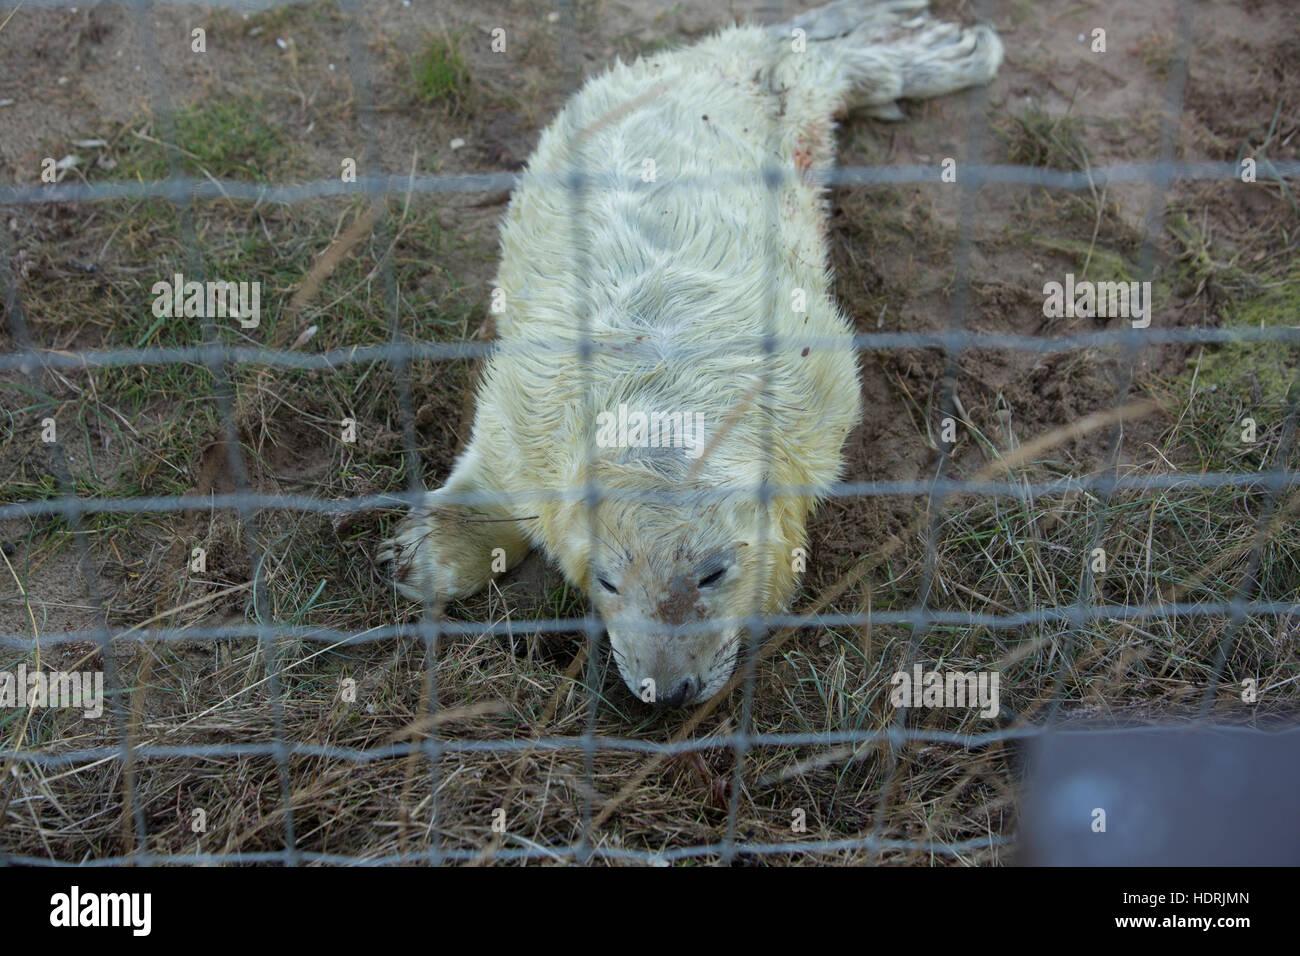 Newly born grey seal. - Stock Image